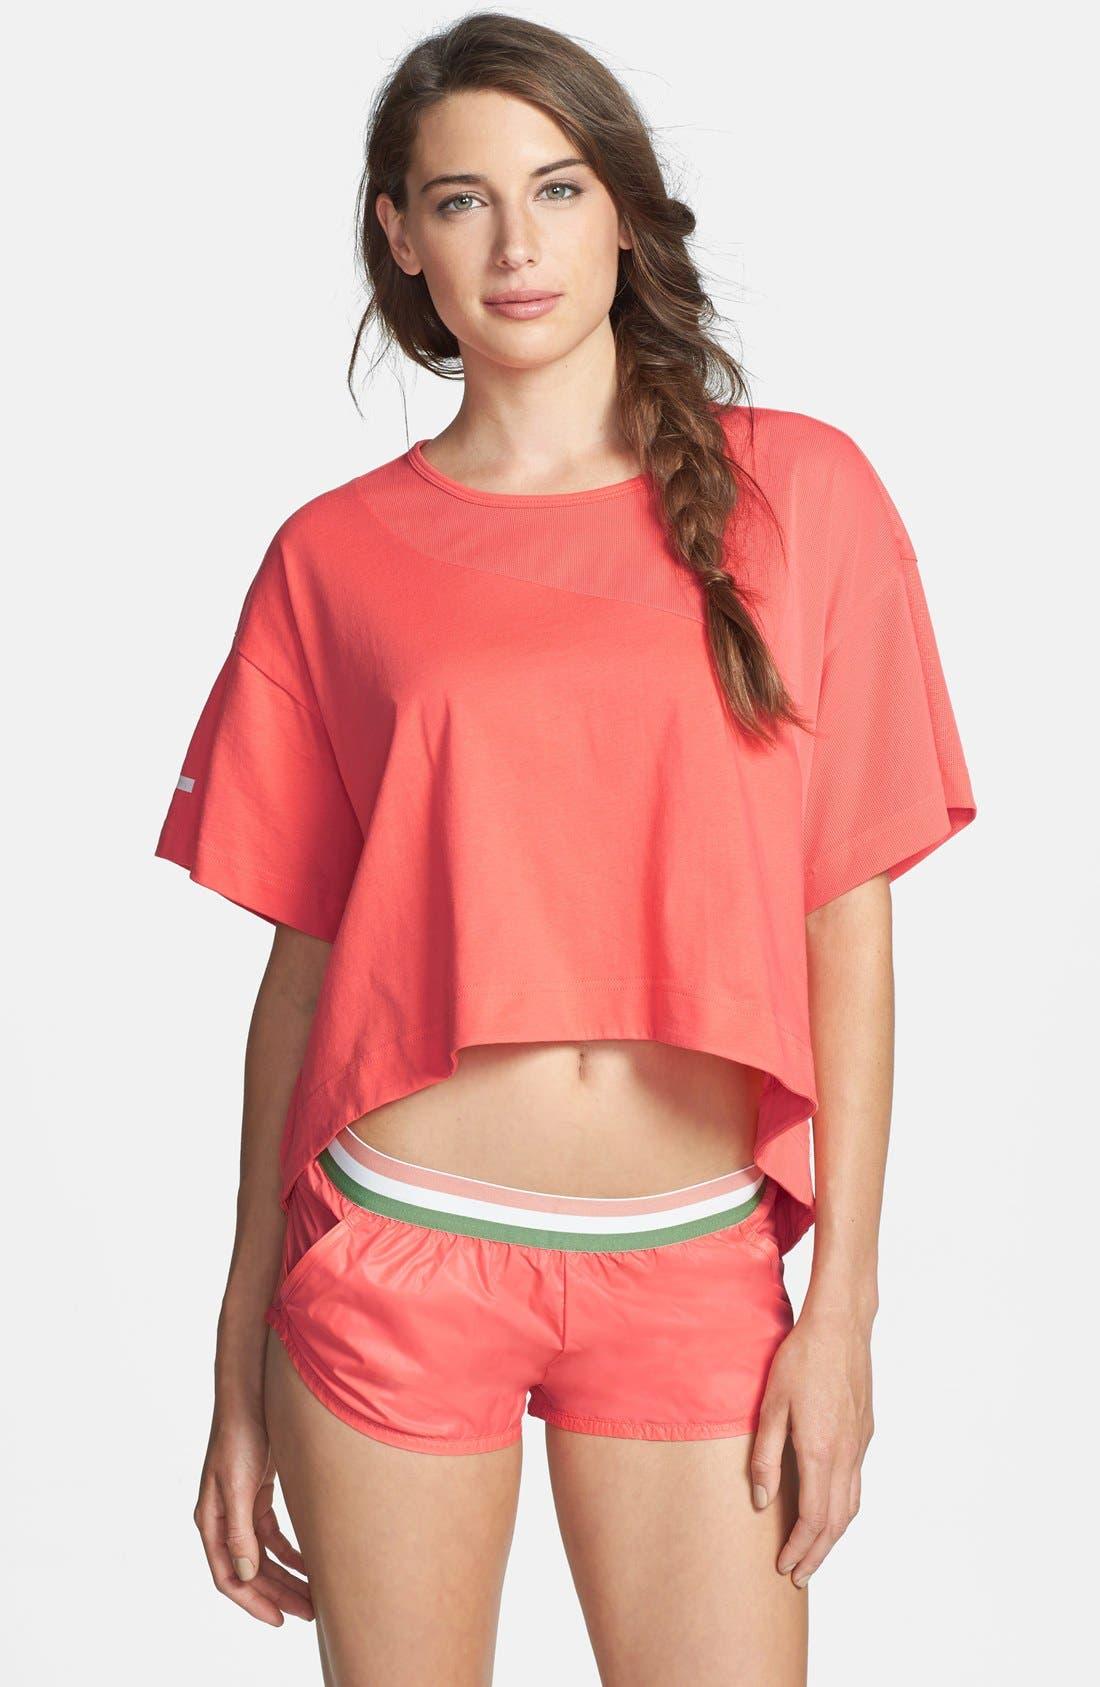 Alternate Image 1 Selected - adidas by Stella McCartney 'Yoga Loose' High/Low Crop Tee